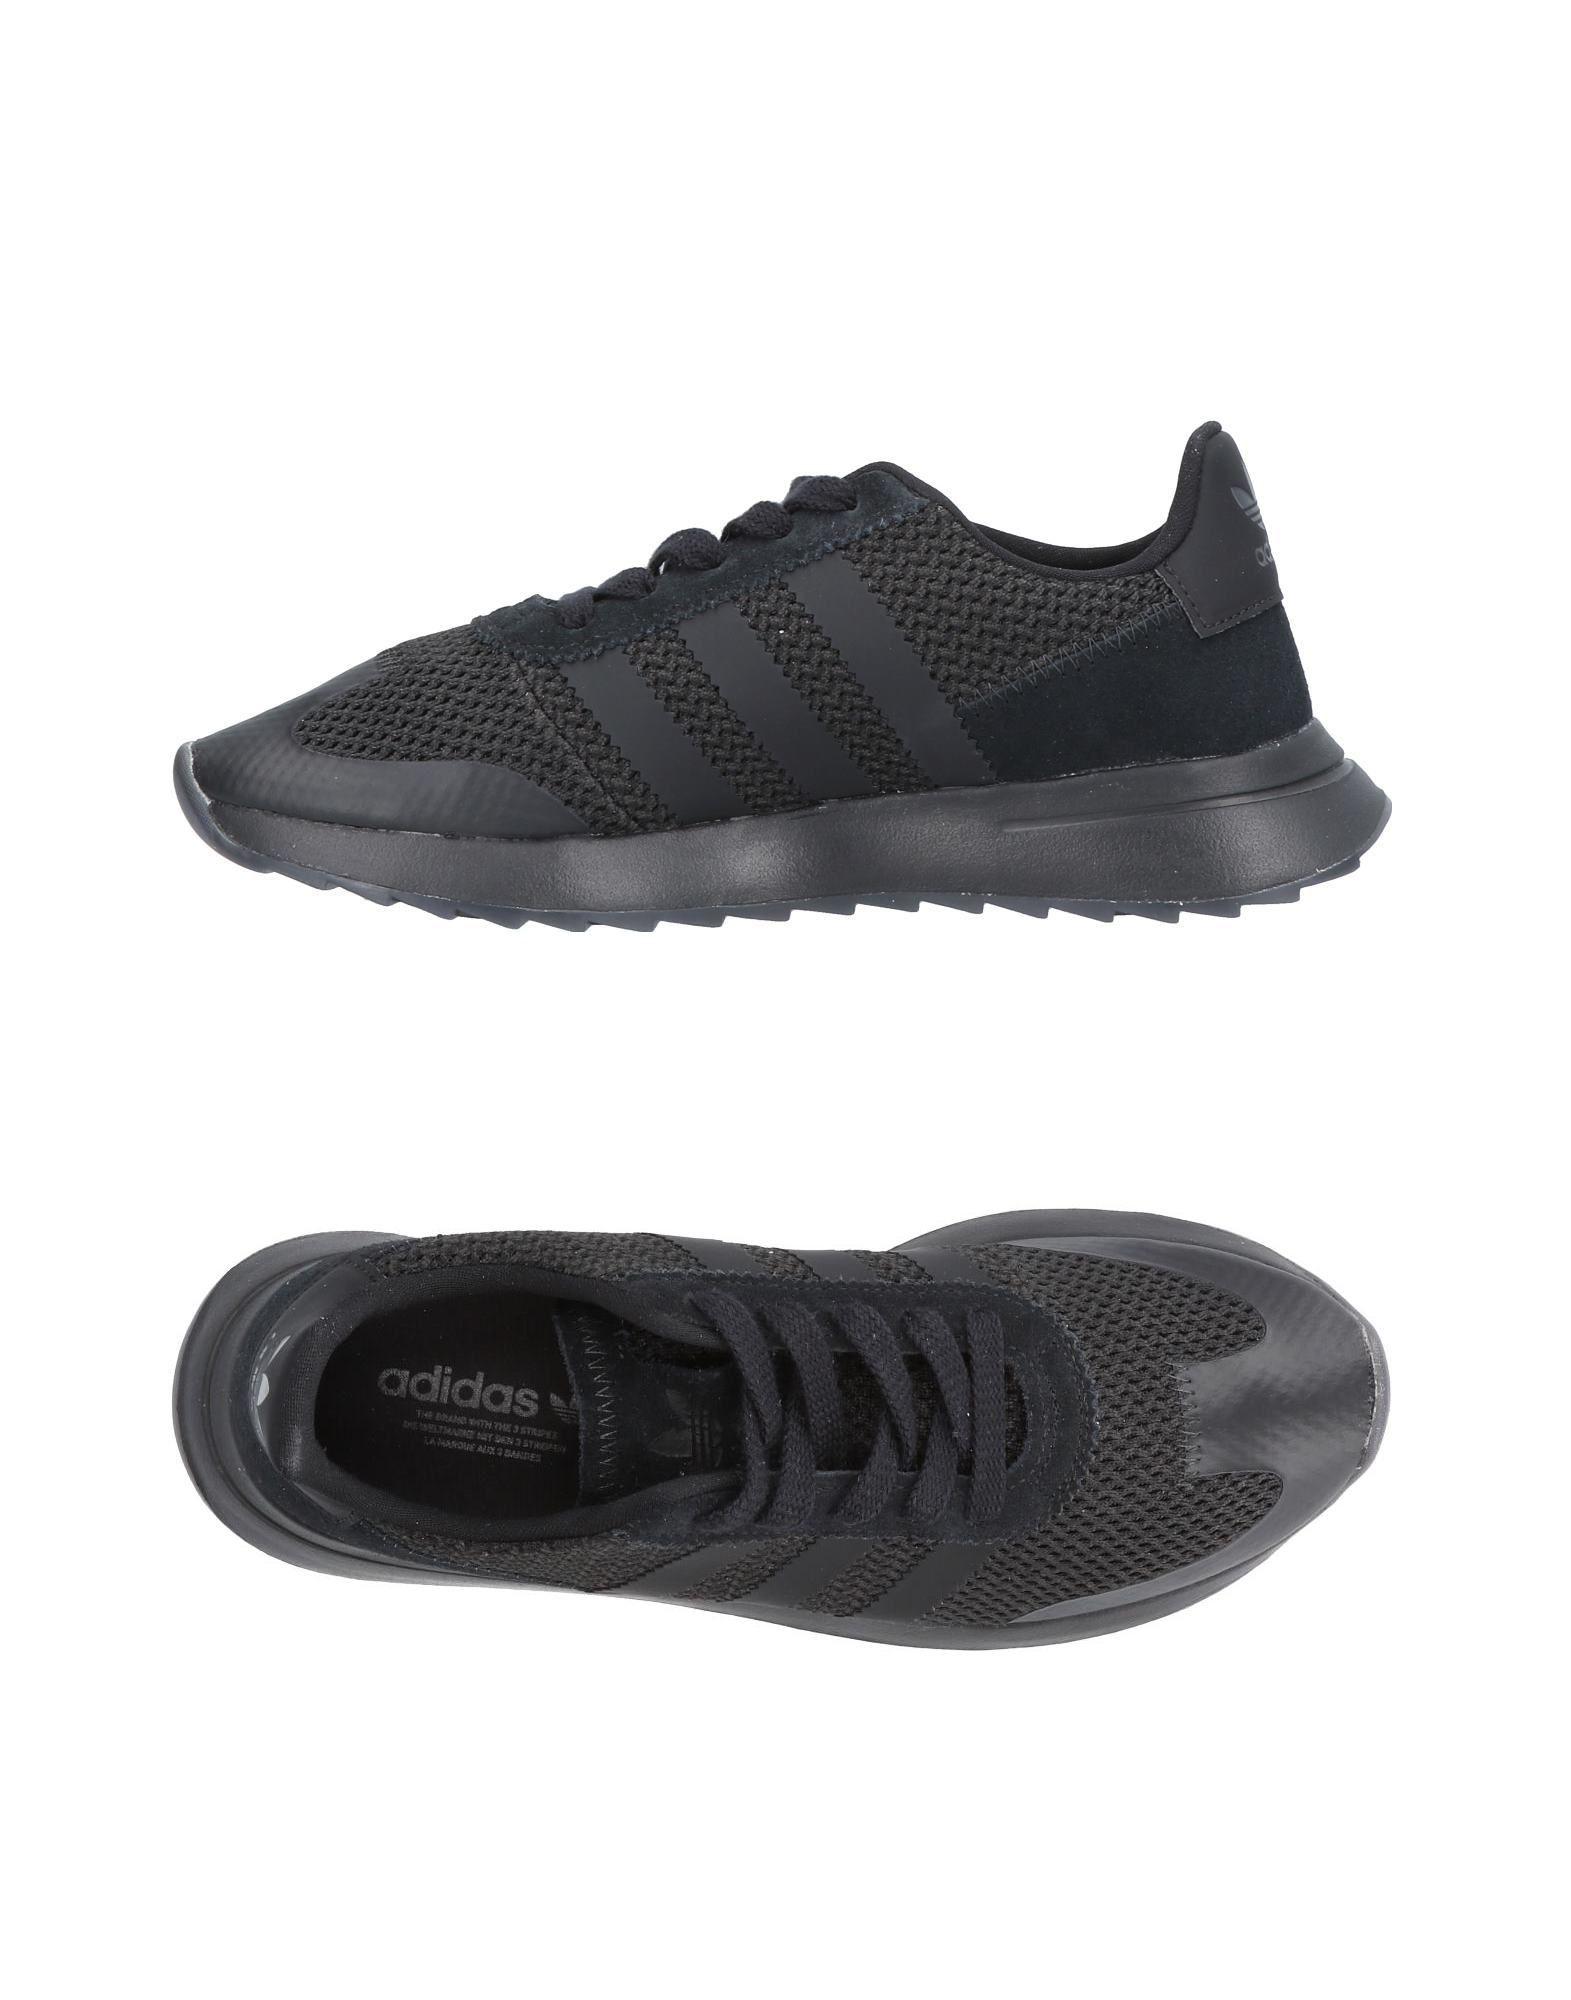 Sneakers Adidas Originals Femme - Sneakers Adidas Originals sur